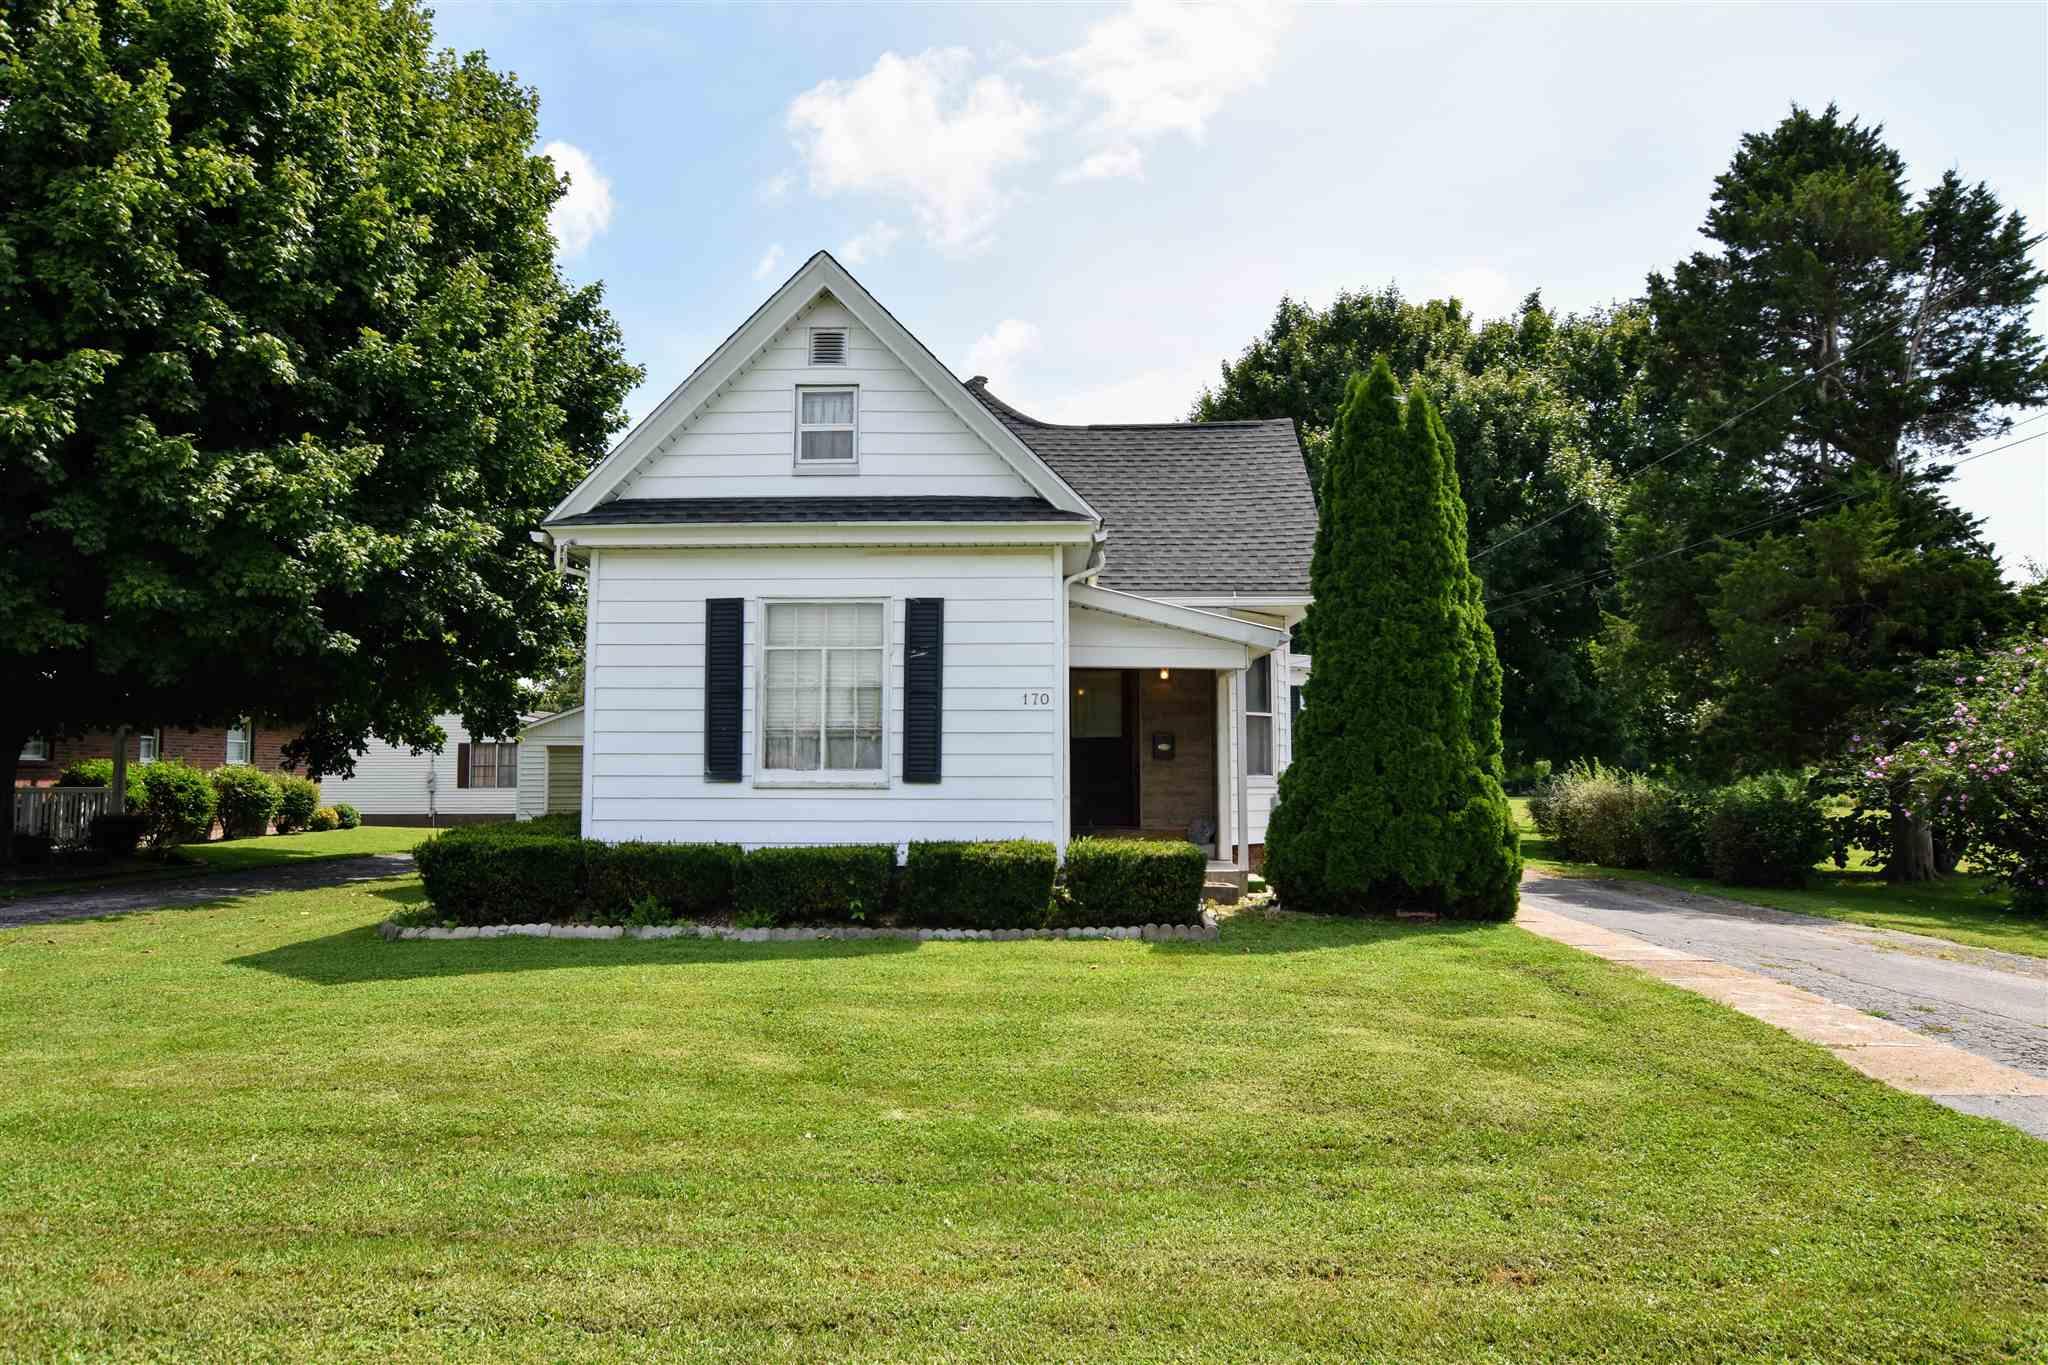 170 S WALNUT Property Photo - Winchester, IL real estate listing